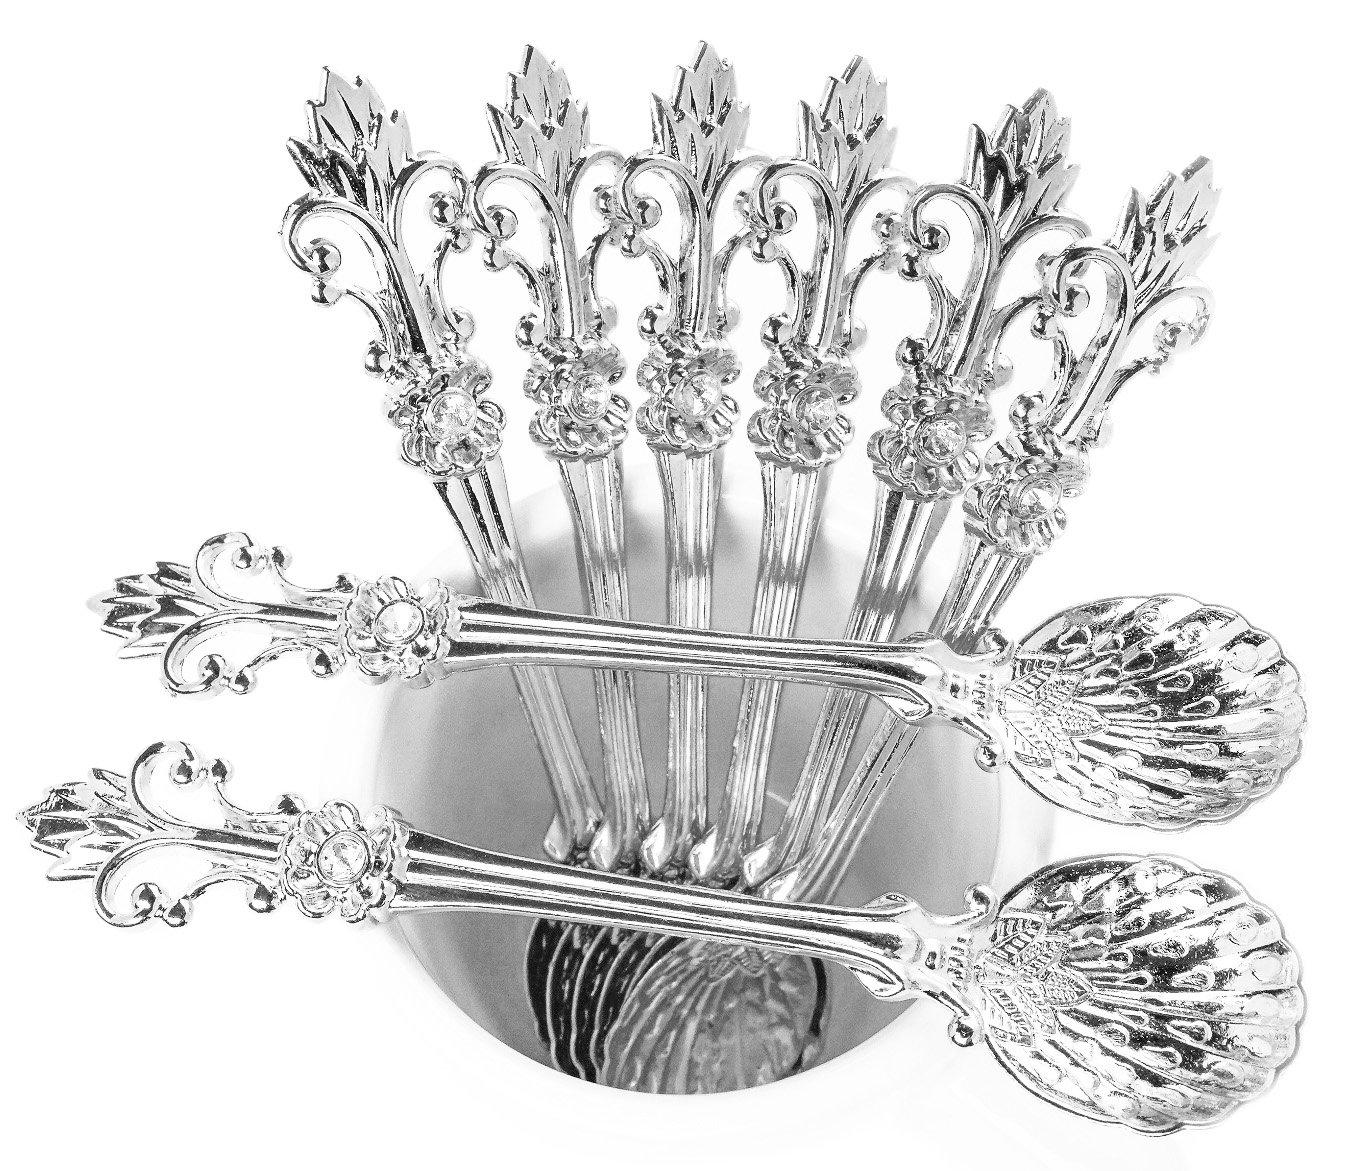 Mini Spoons Set of 8 by Movalyfe Kitchen - Coffee Espresso Demitasse Vintage Spoon 4.5'' Long (Sliver)